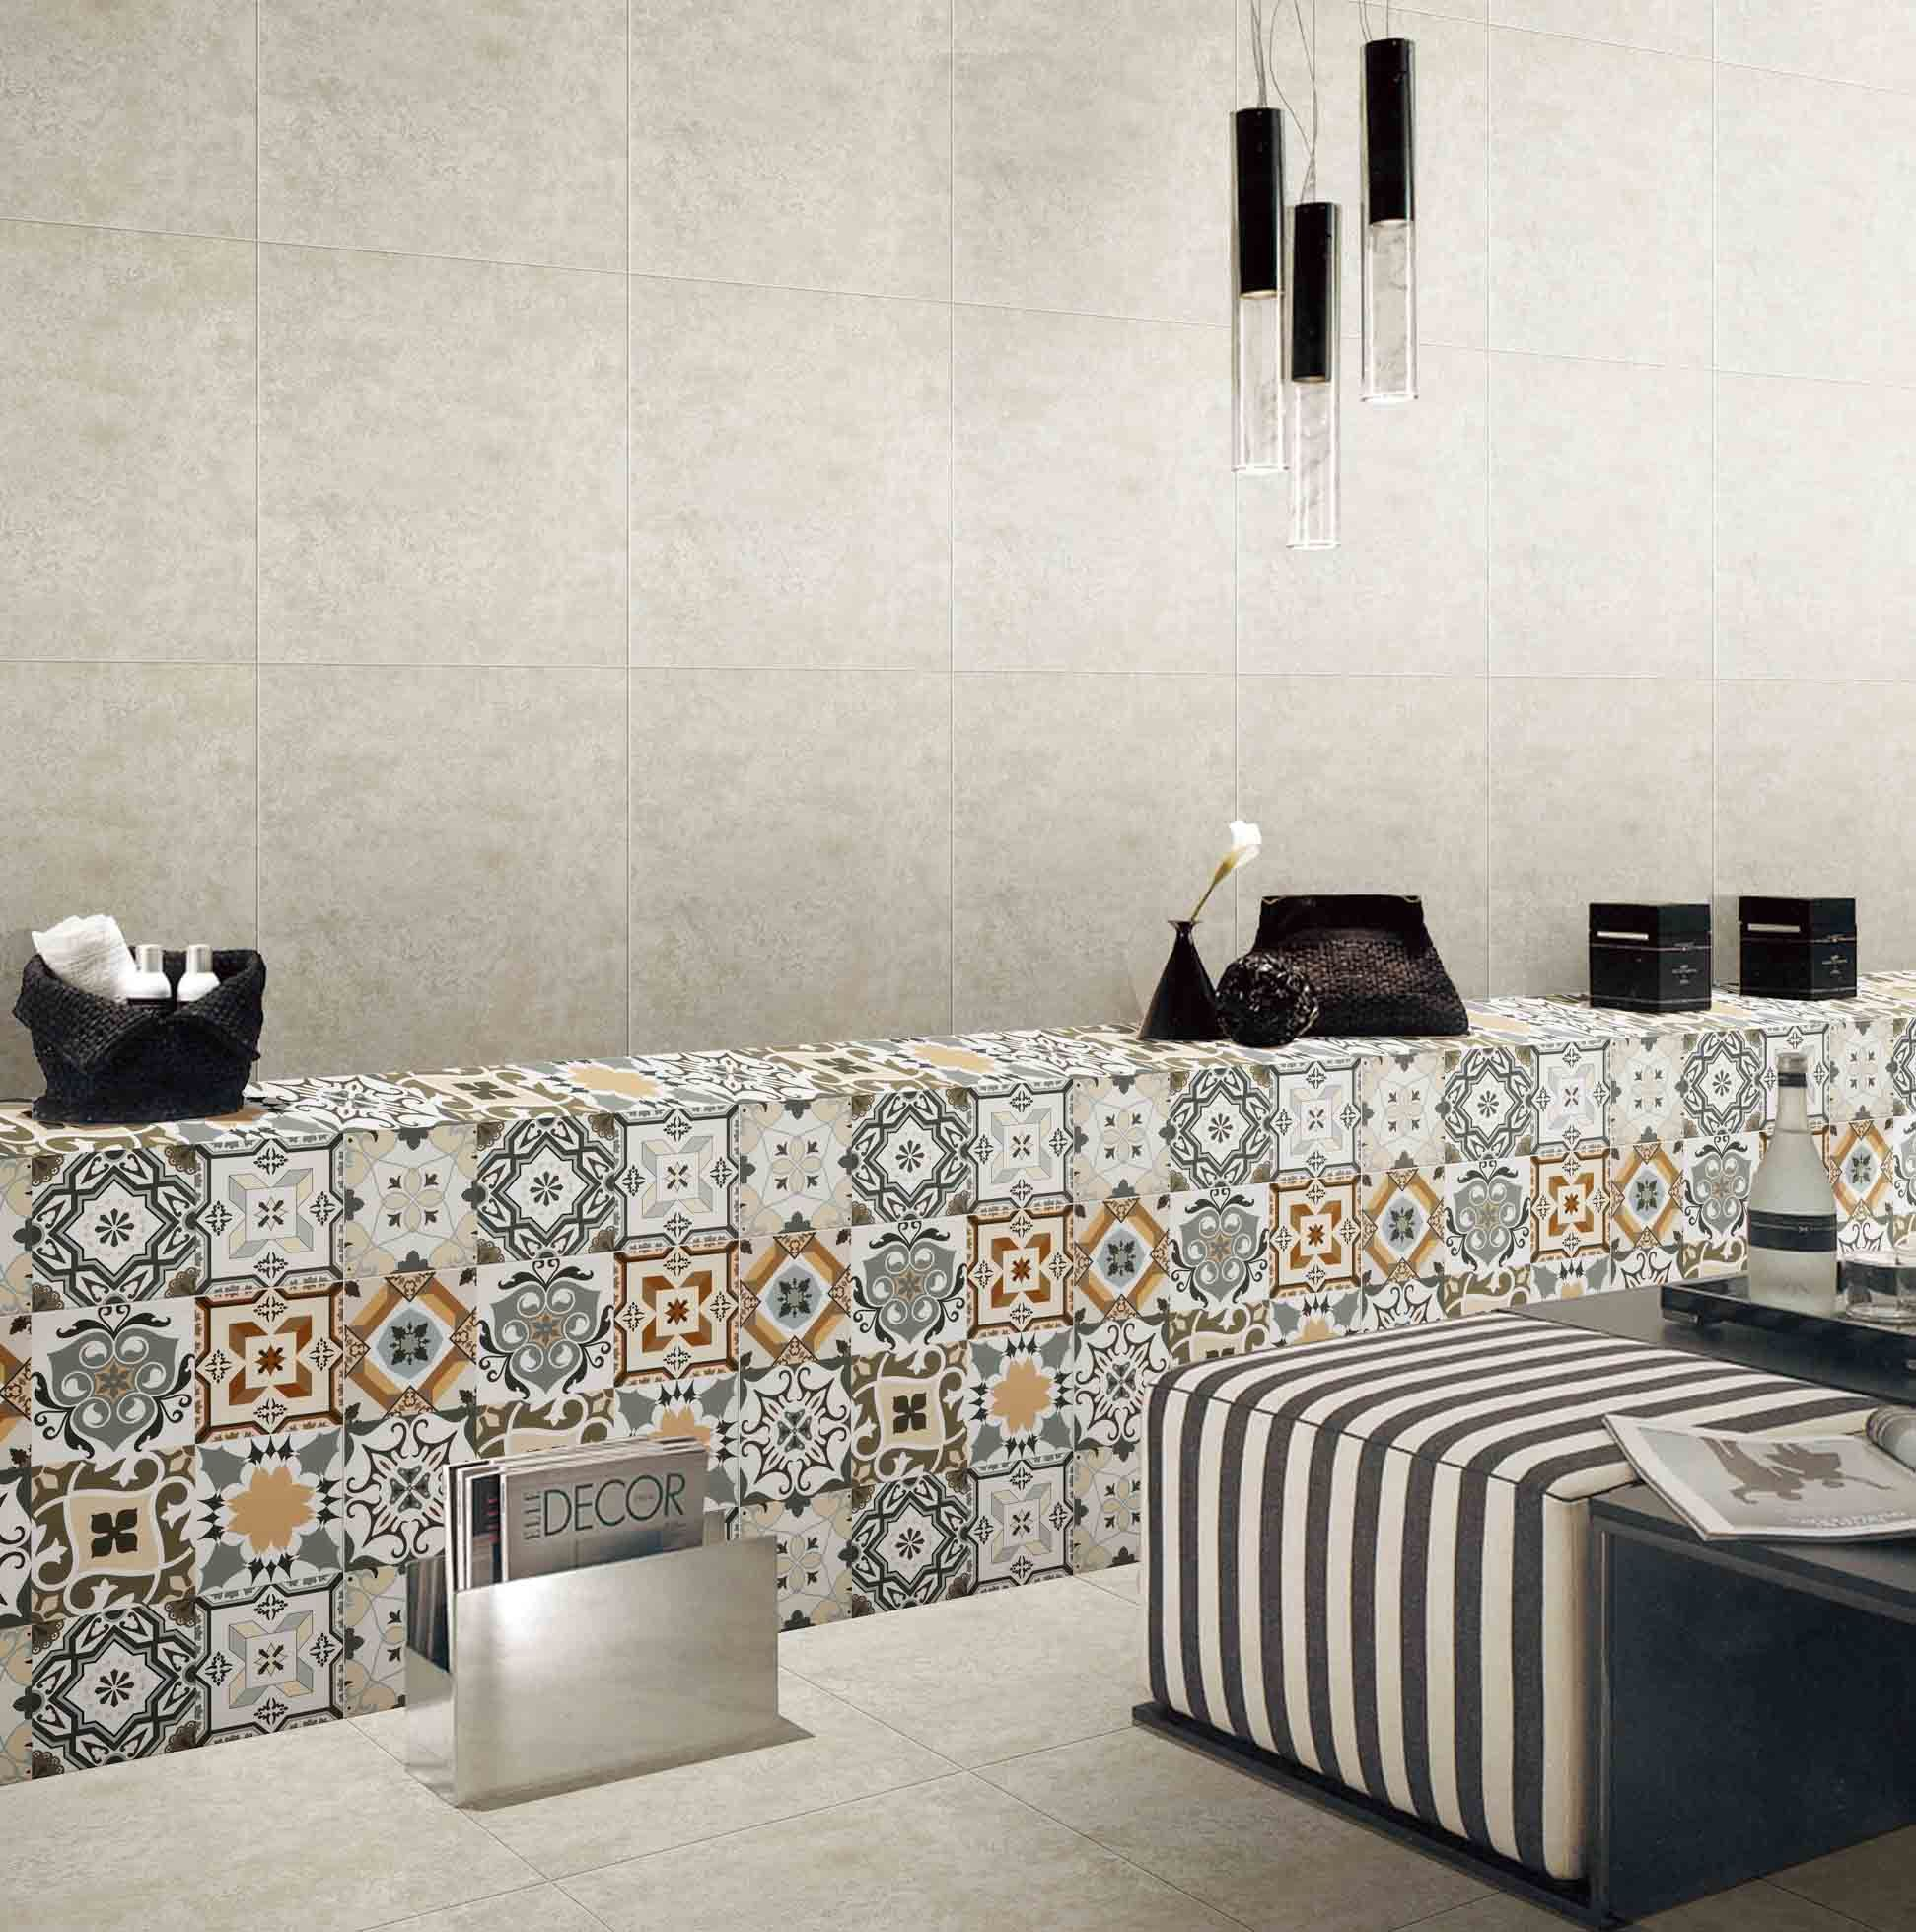 art glazed decoration tile for wall floor tile 600600 mm for coffee room restaurant hotel decoration sh6h00304